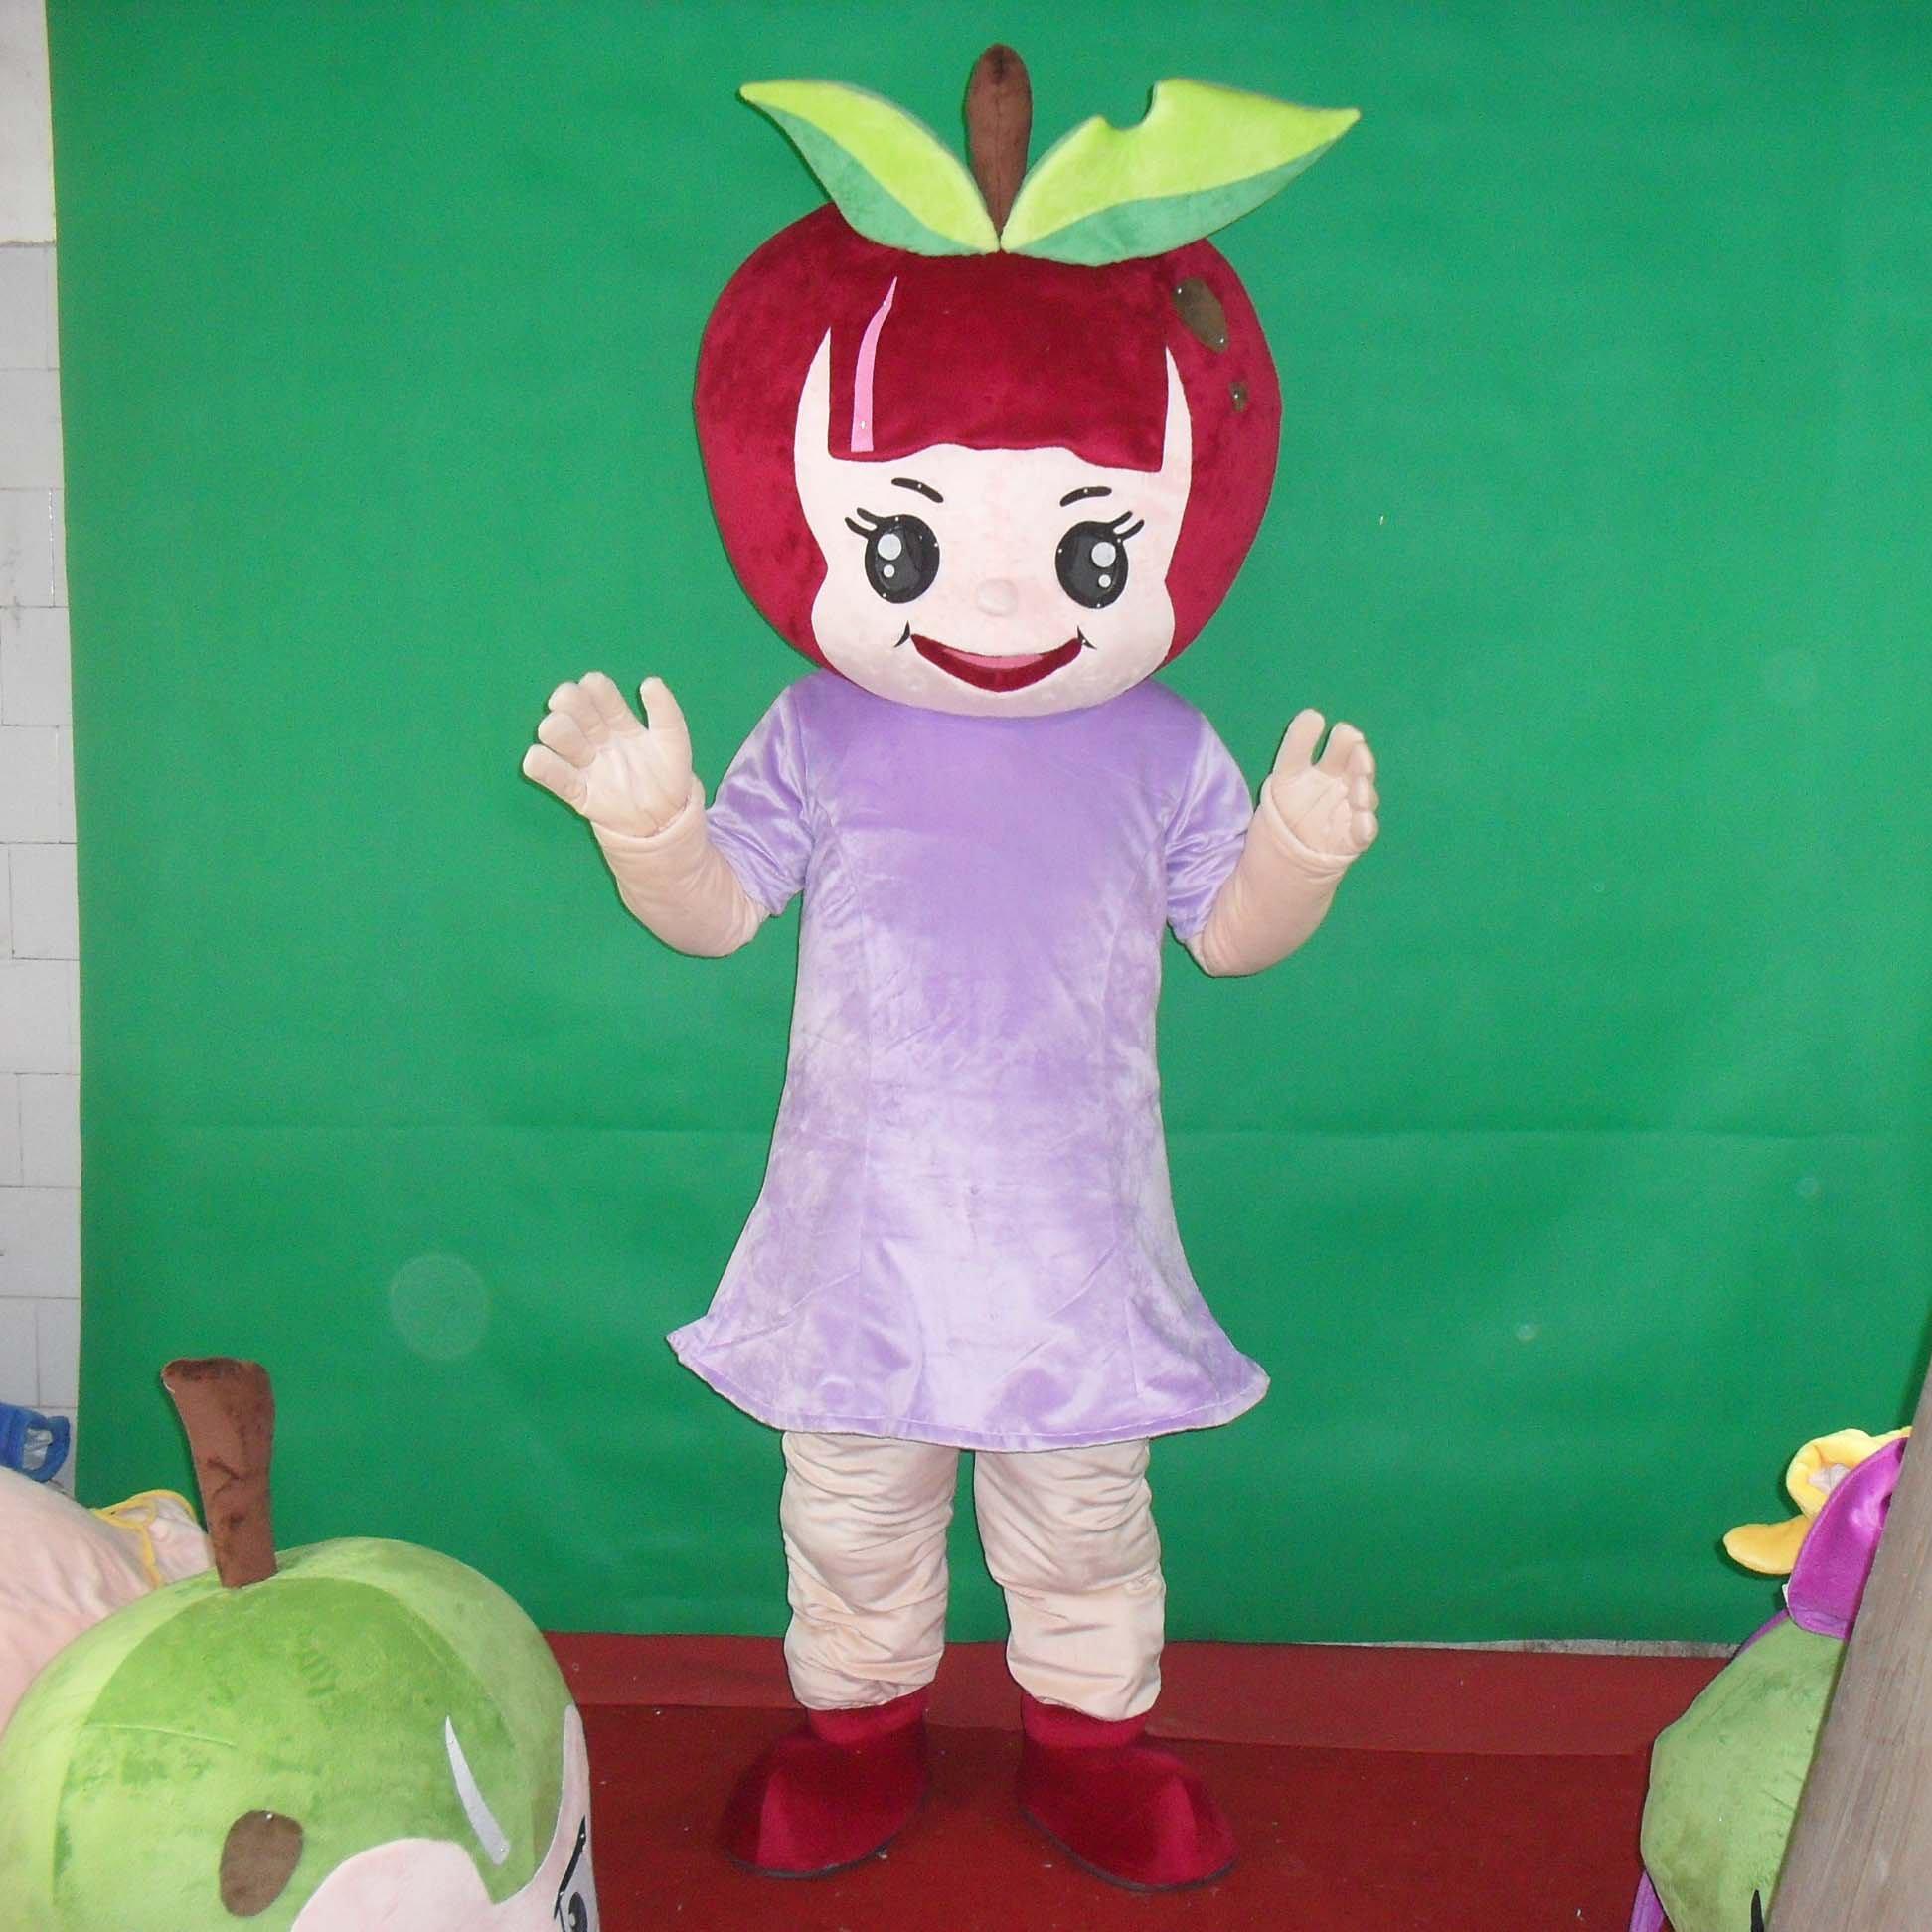 Red Apple Red Apple Walking Cartoon Doll Clothing Cartoon Show Clothing Cartoon Dolls Apple Mascot Costume